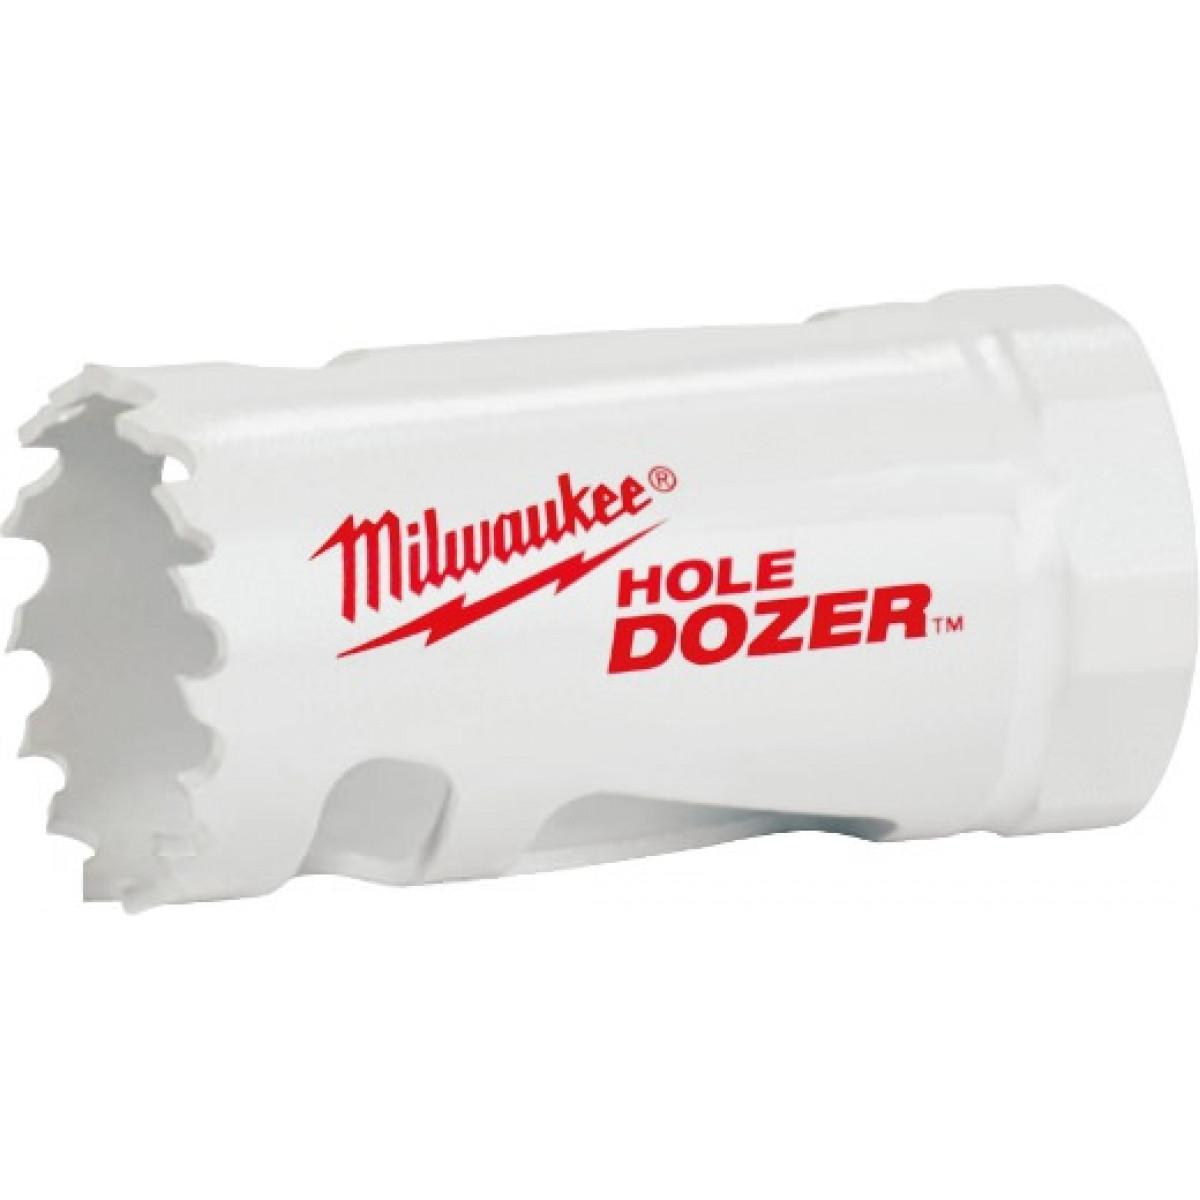 Milwaukee® 49-56-0002 Hole Dozer™ 49-56 Hole Saw, 9/16 in Dia, 1-5/8 in D Cutting, Bi-Metal/8% Cobalt Cutting Edge, 1/2-20 Arbor